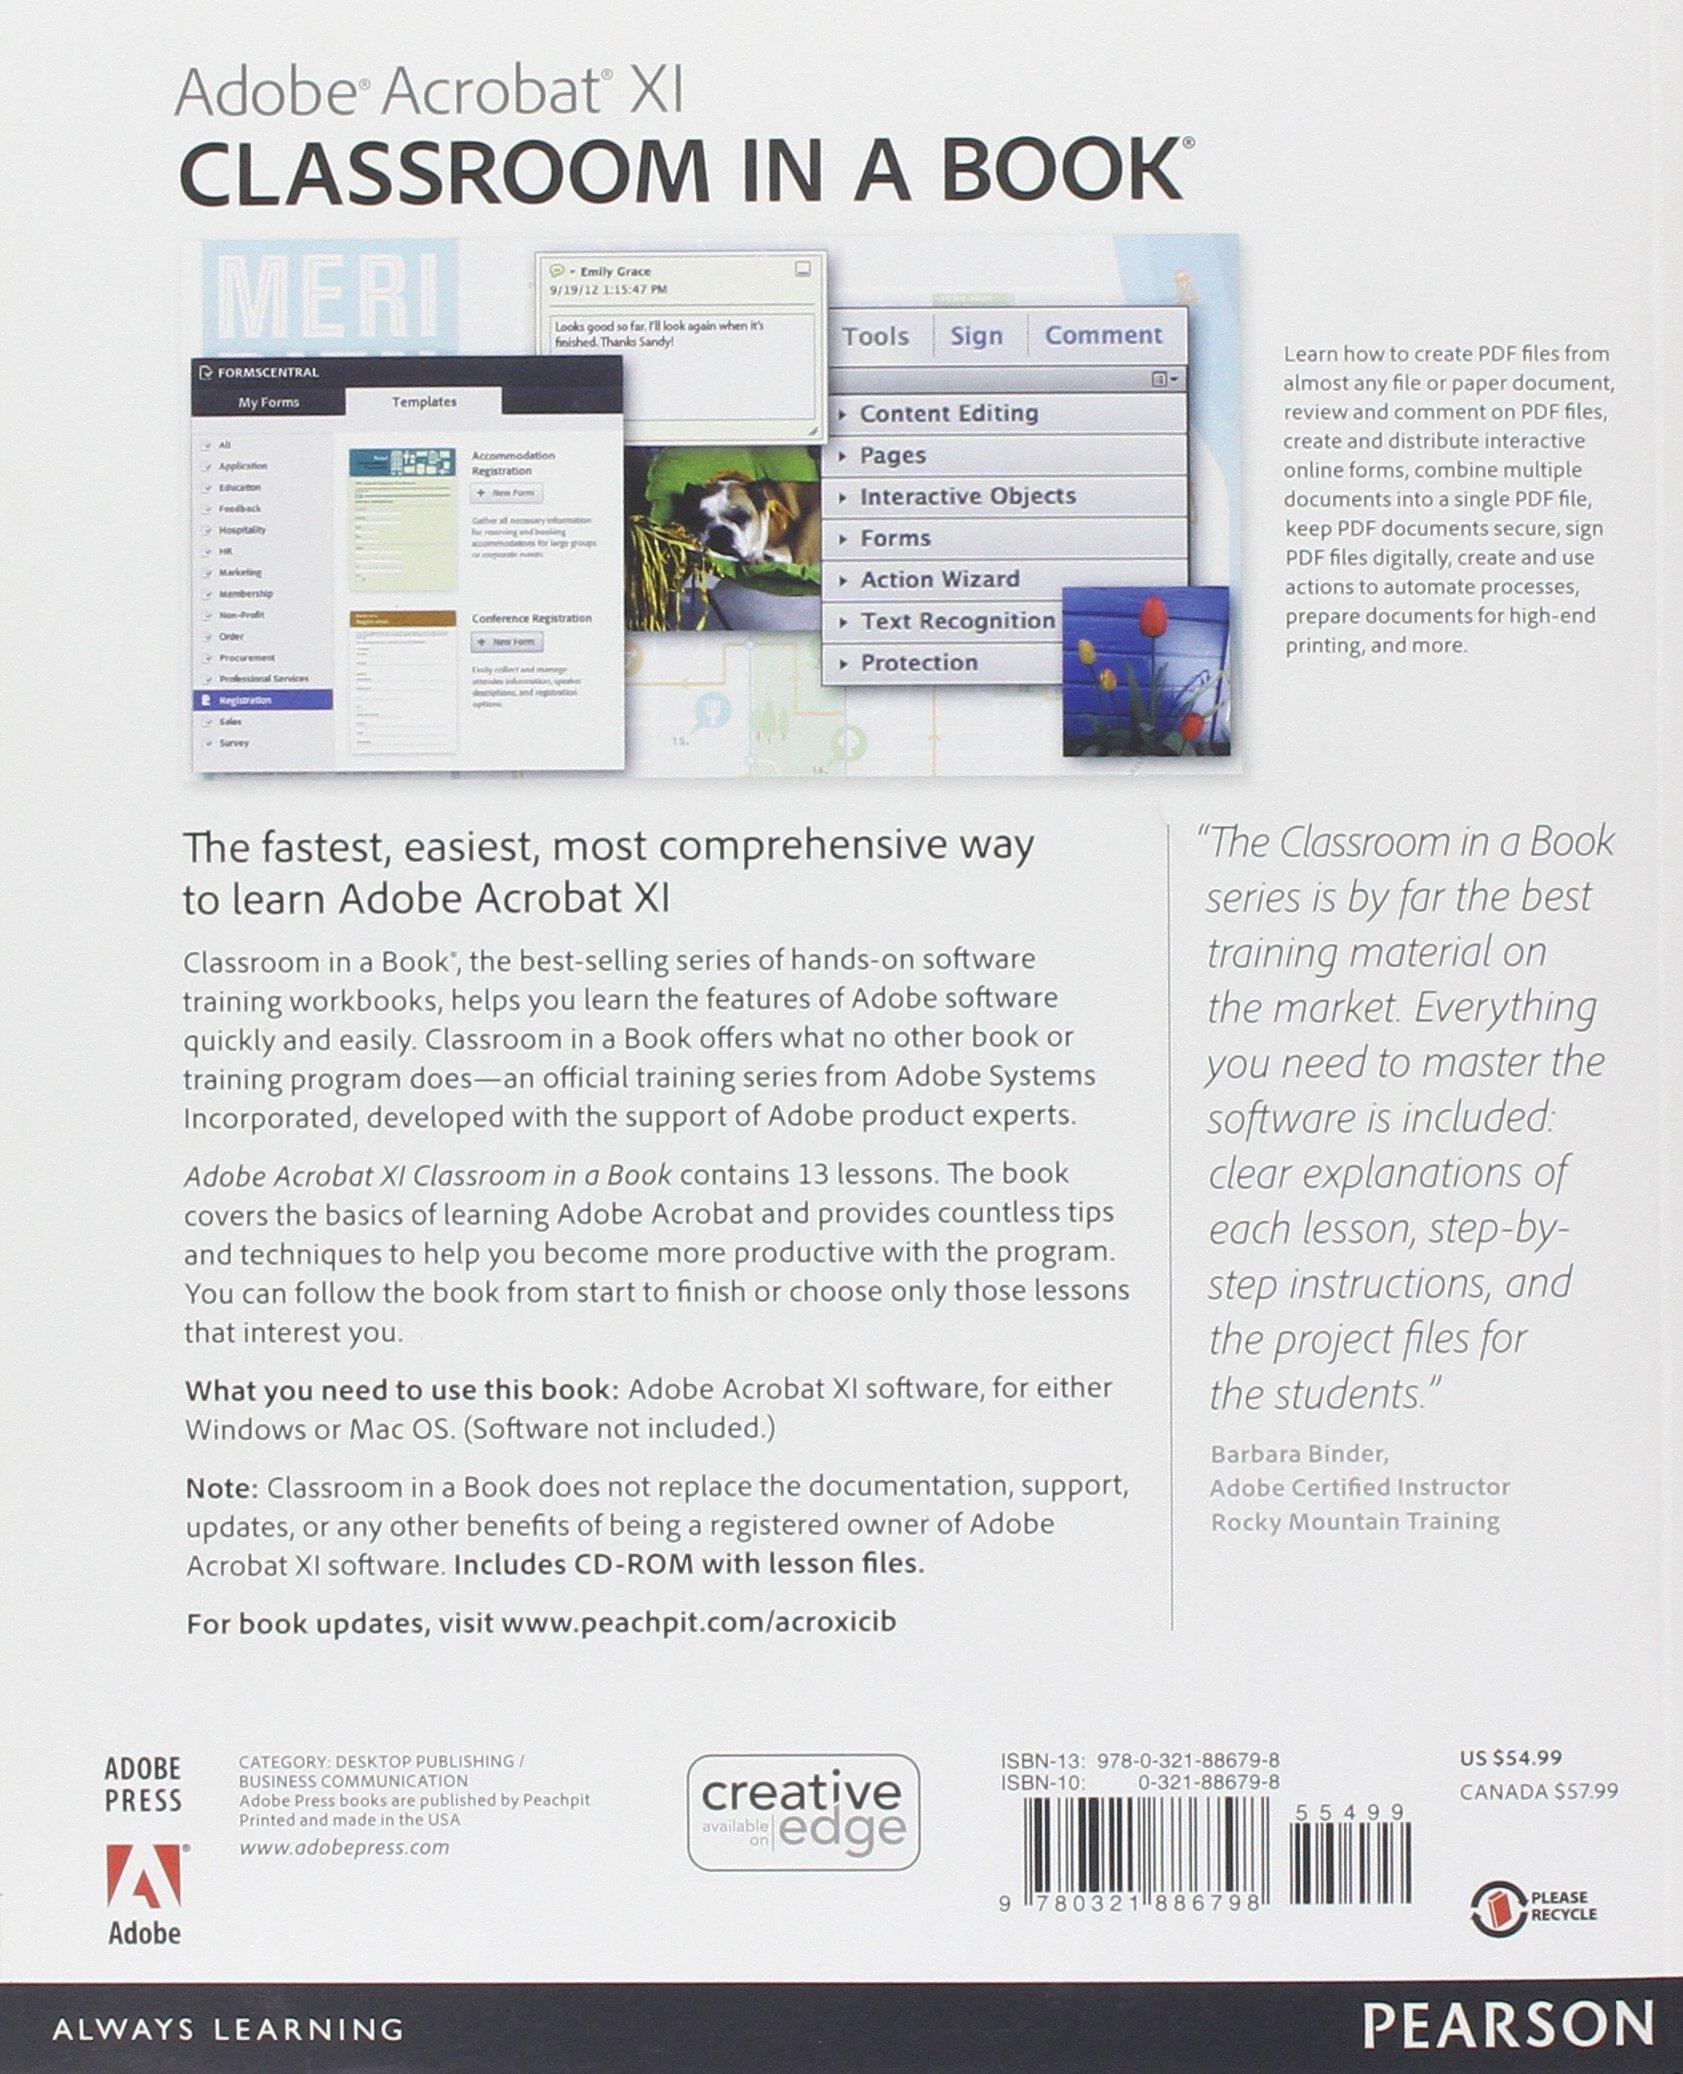 Adobe Acrobat XI Classroom in a Book (Classroom in a Book